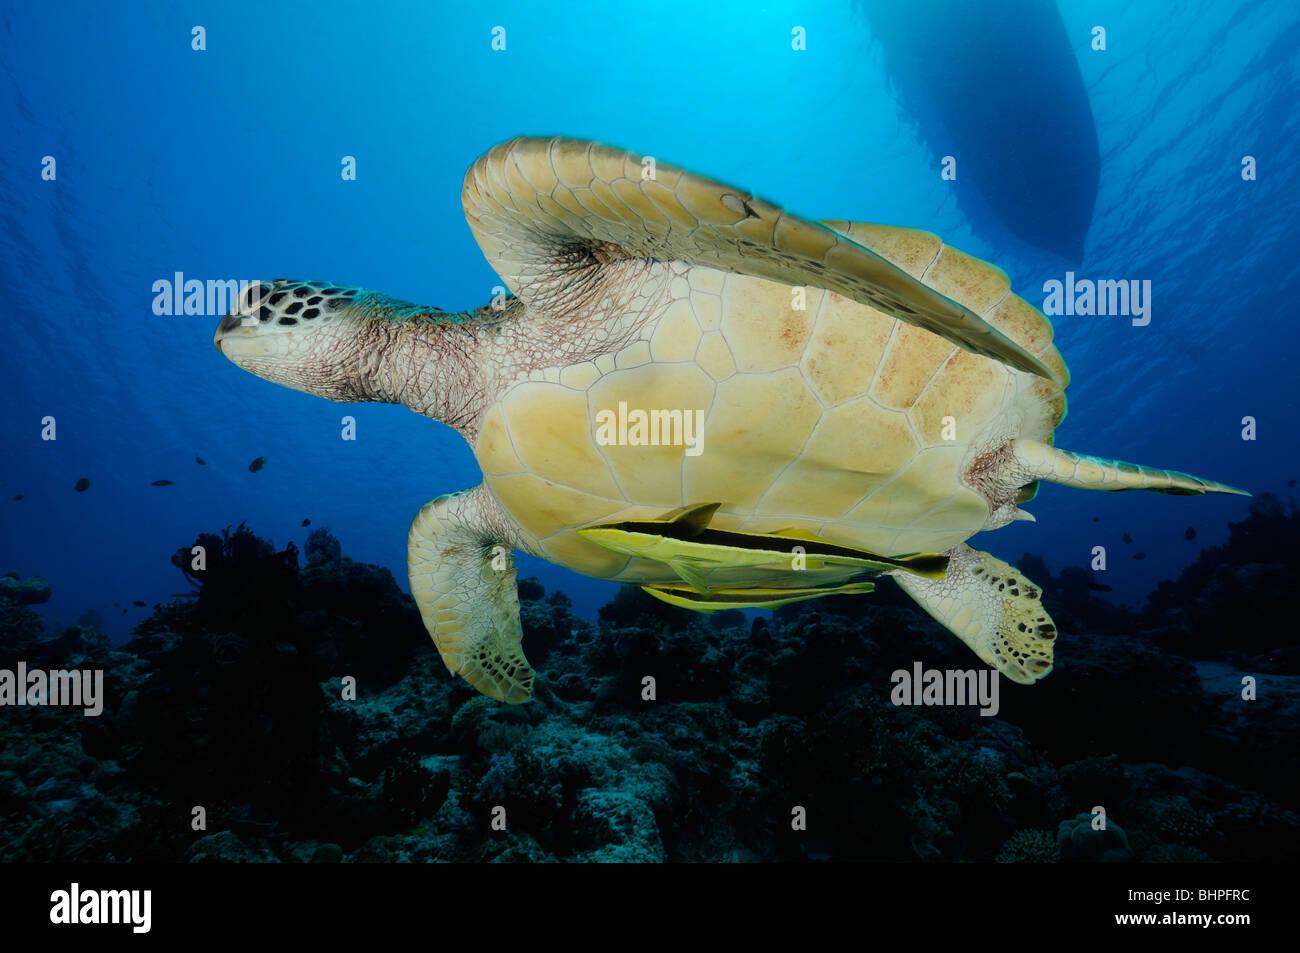 Chelonia mydas, Echeneis naucrates, Green Sea Turtle with Live sharksucker, Sand slope, Nationalpark Island Menjangan, - Stock Image